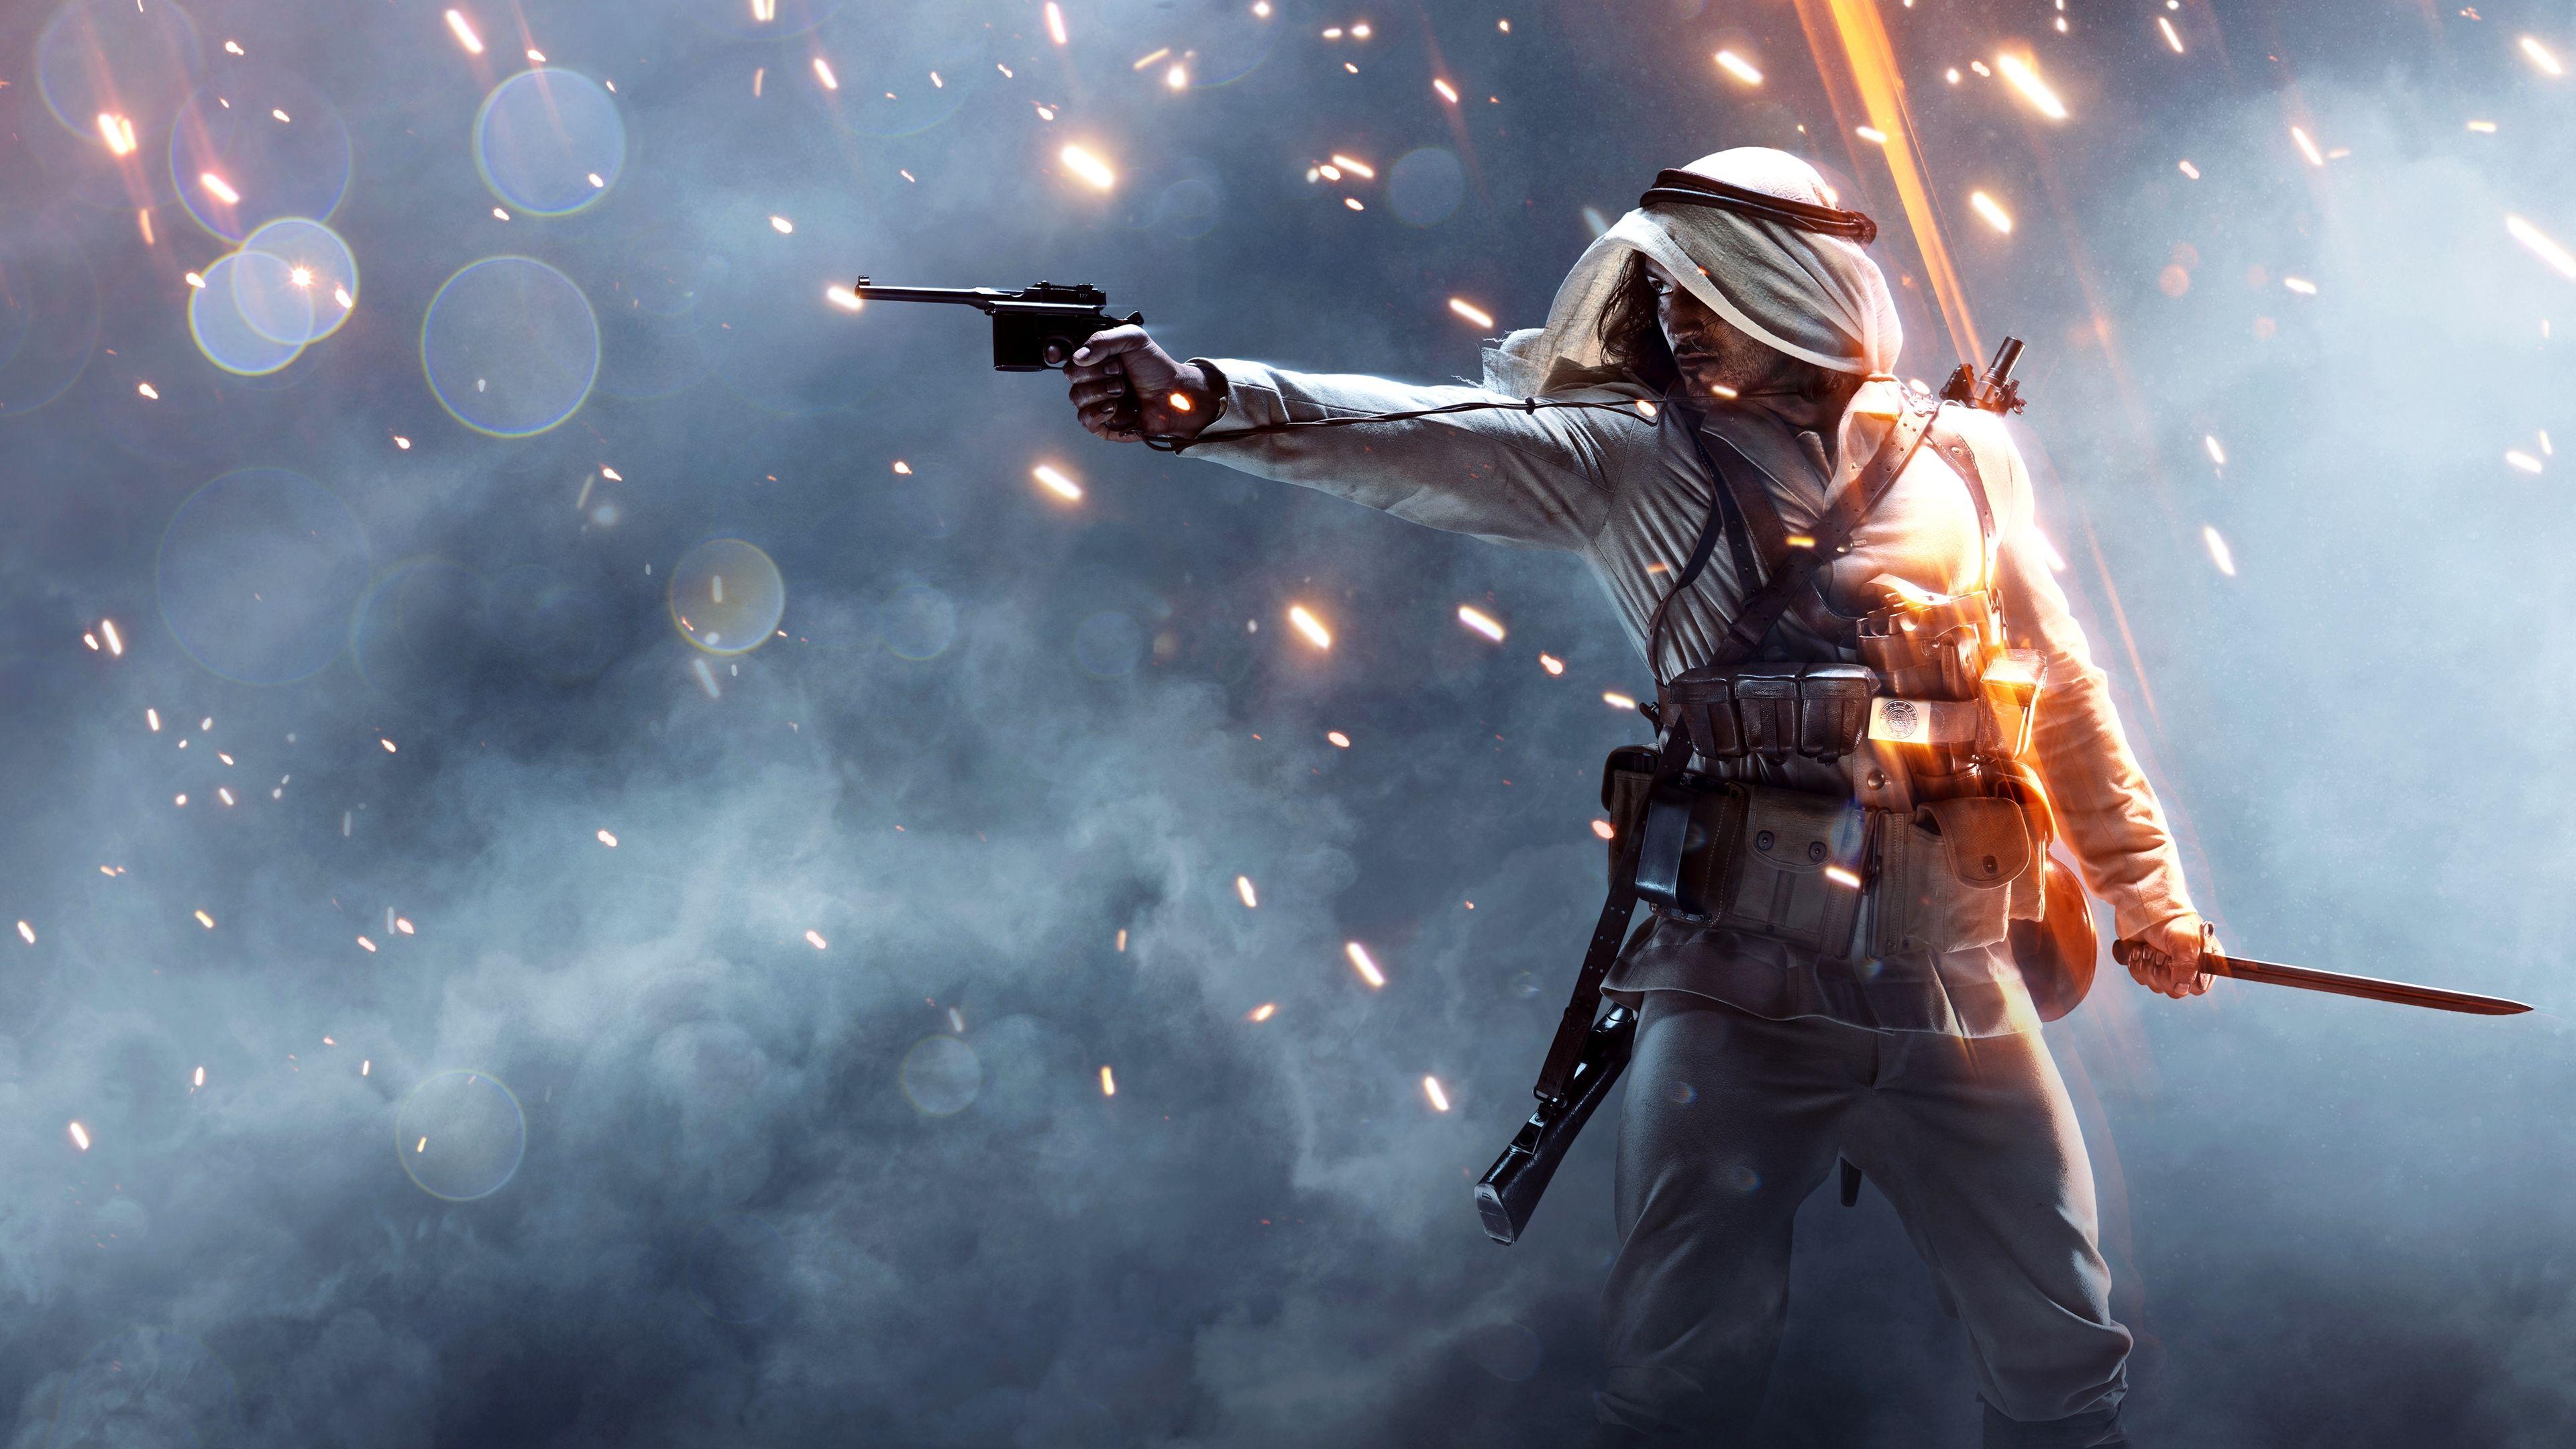 4k Wallpaper Of Pc Games Trick Check More At Https Manyaseema Com 4k Wallpaper Of Pc Games Di 2020 Battlefield